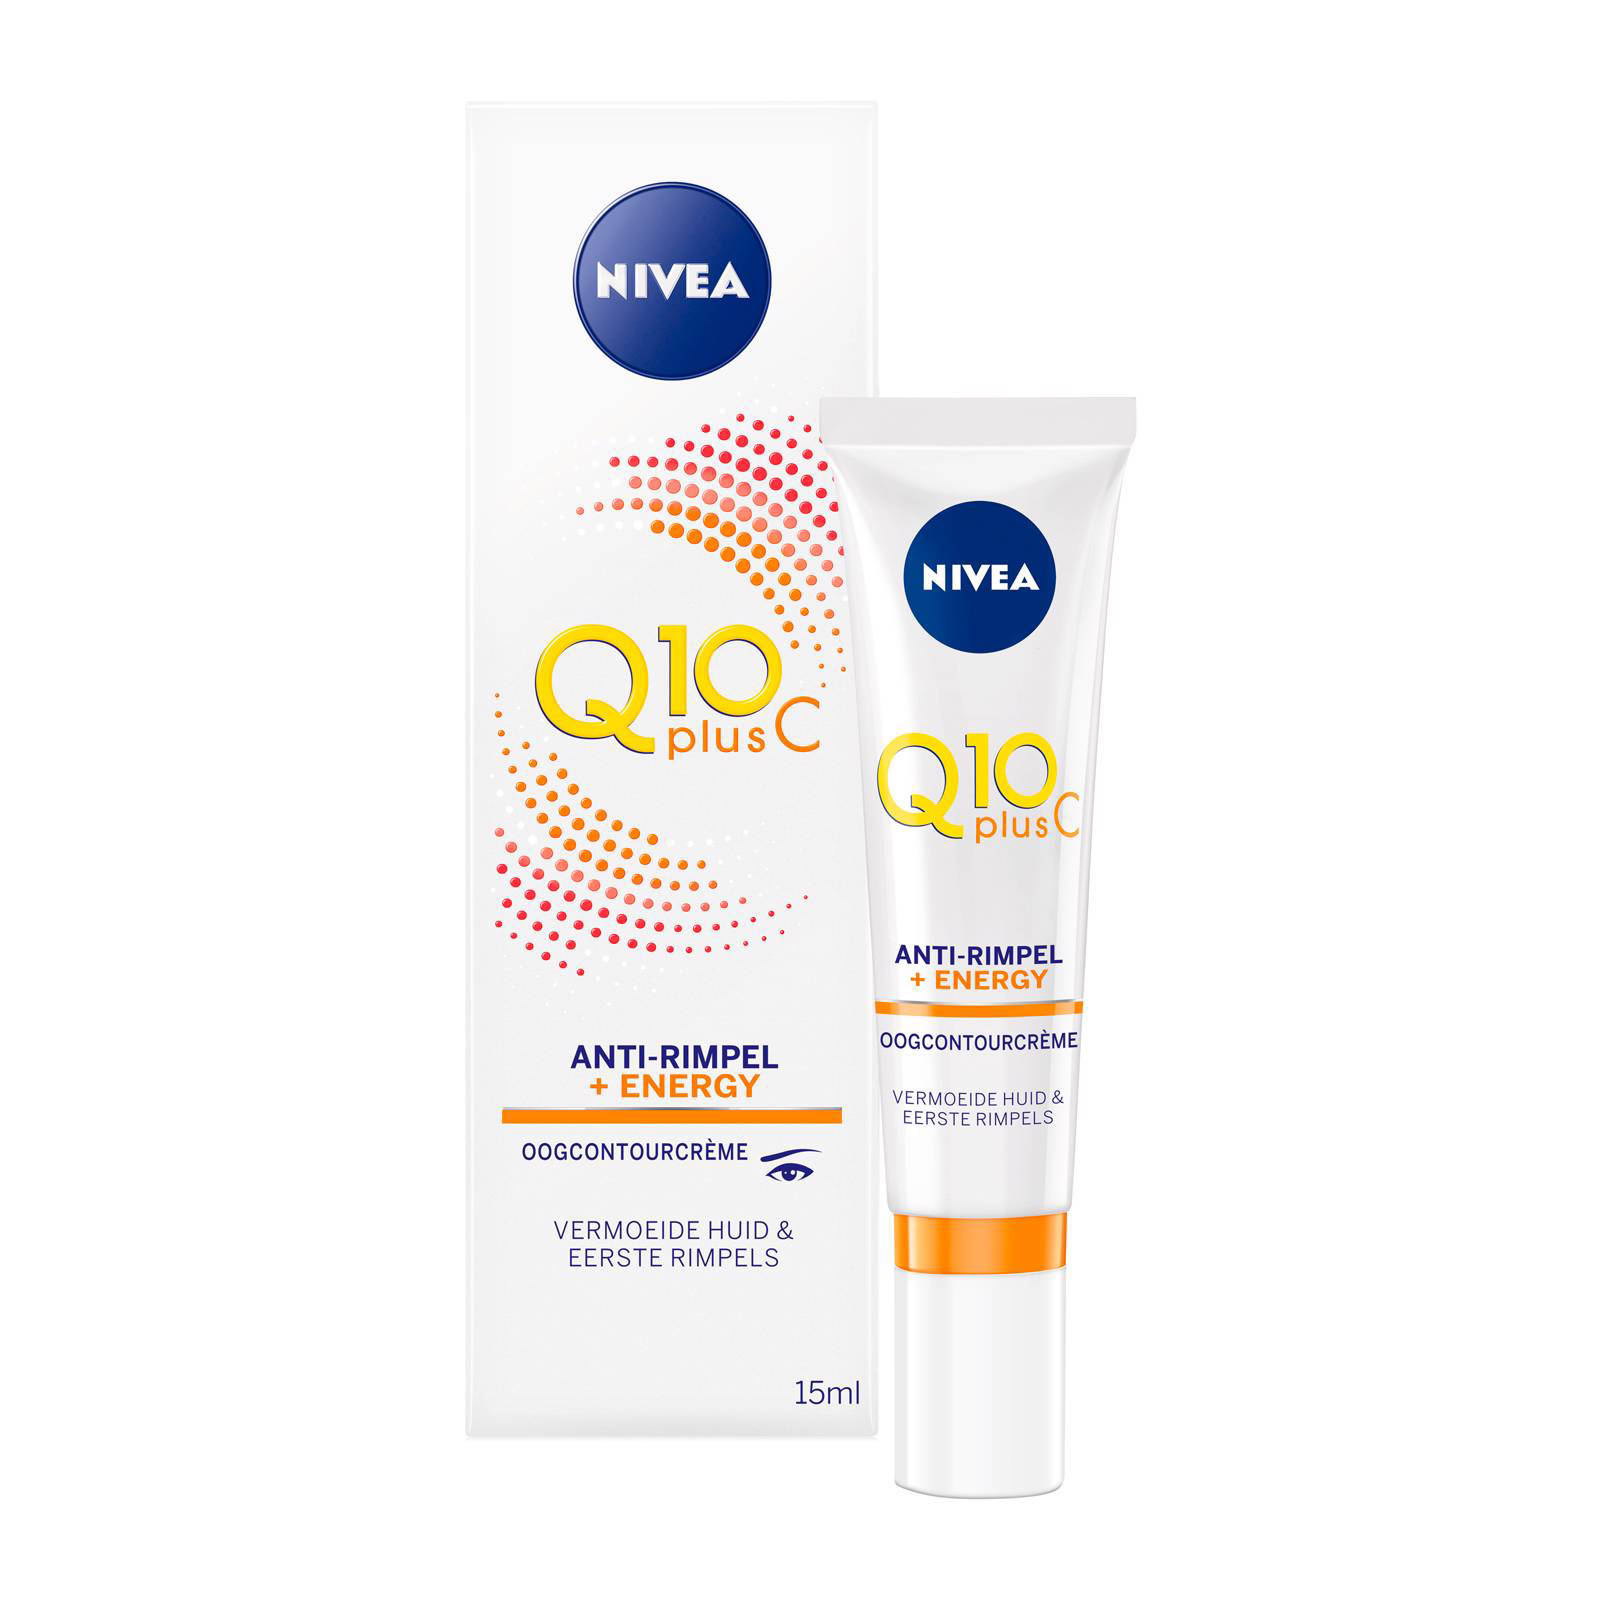 NIVEA Q10plusC Anti-Rimpel +Energy Oogcontourcreme - 15ml